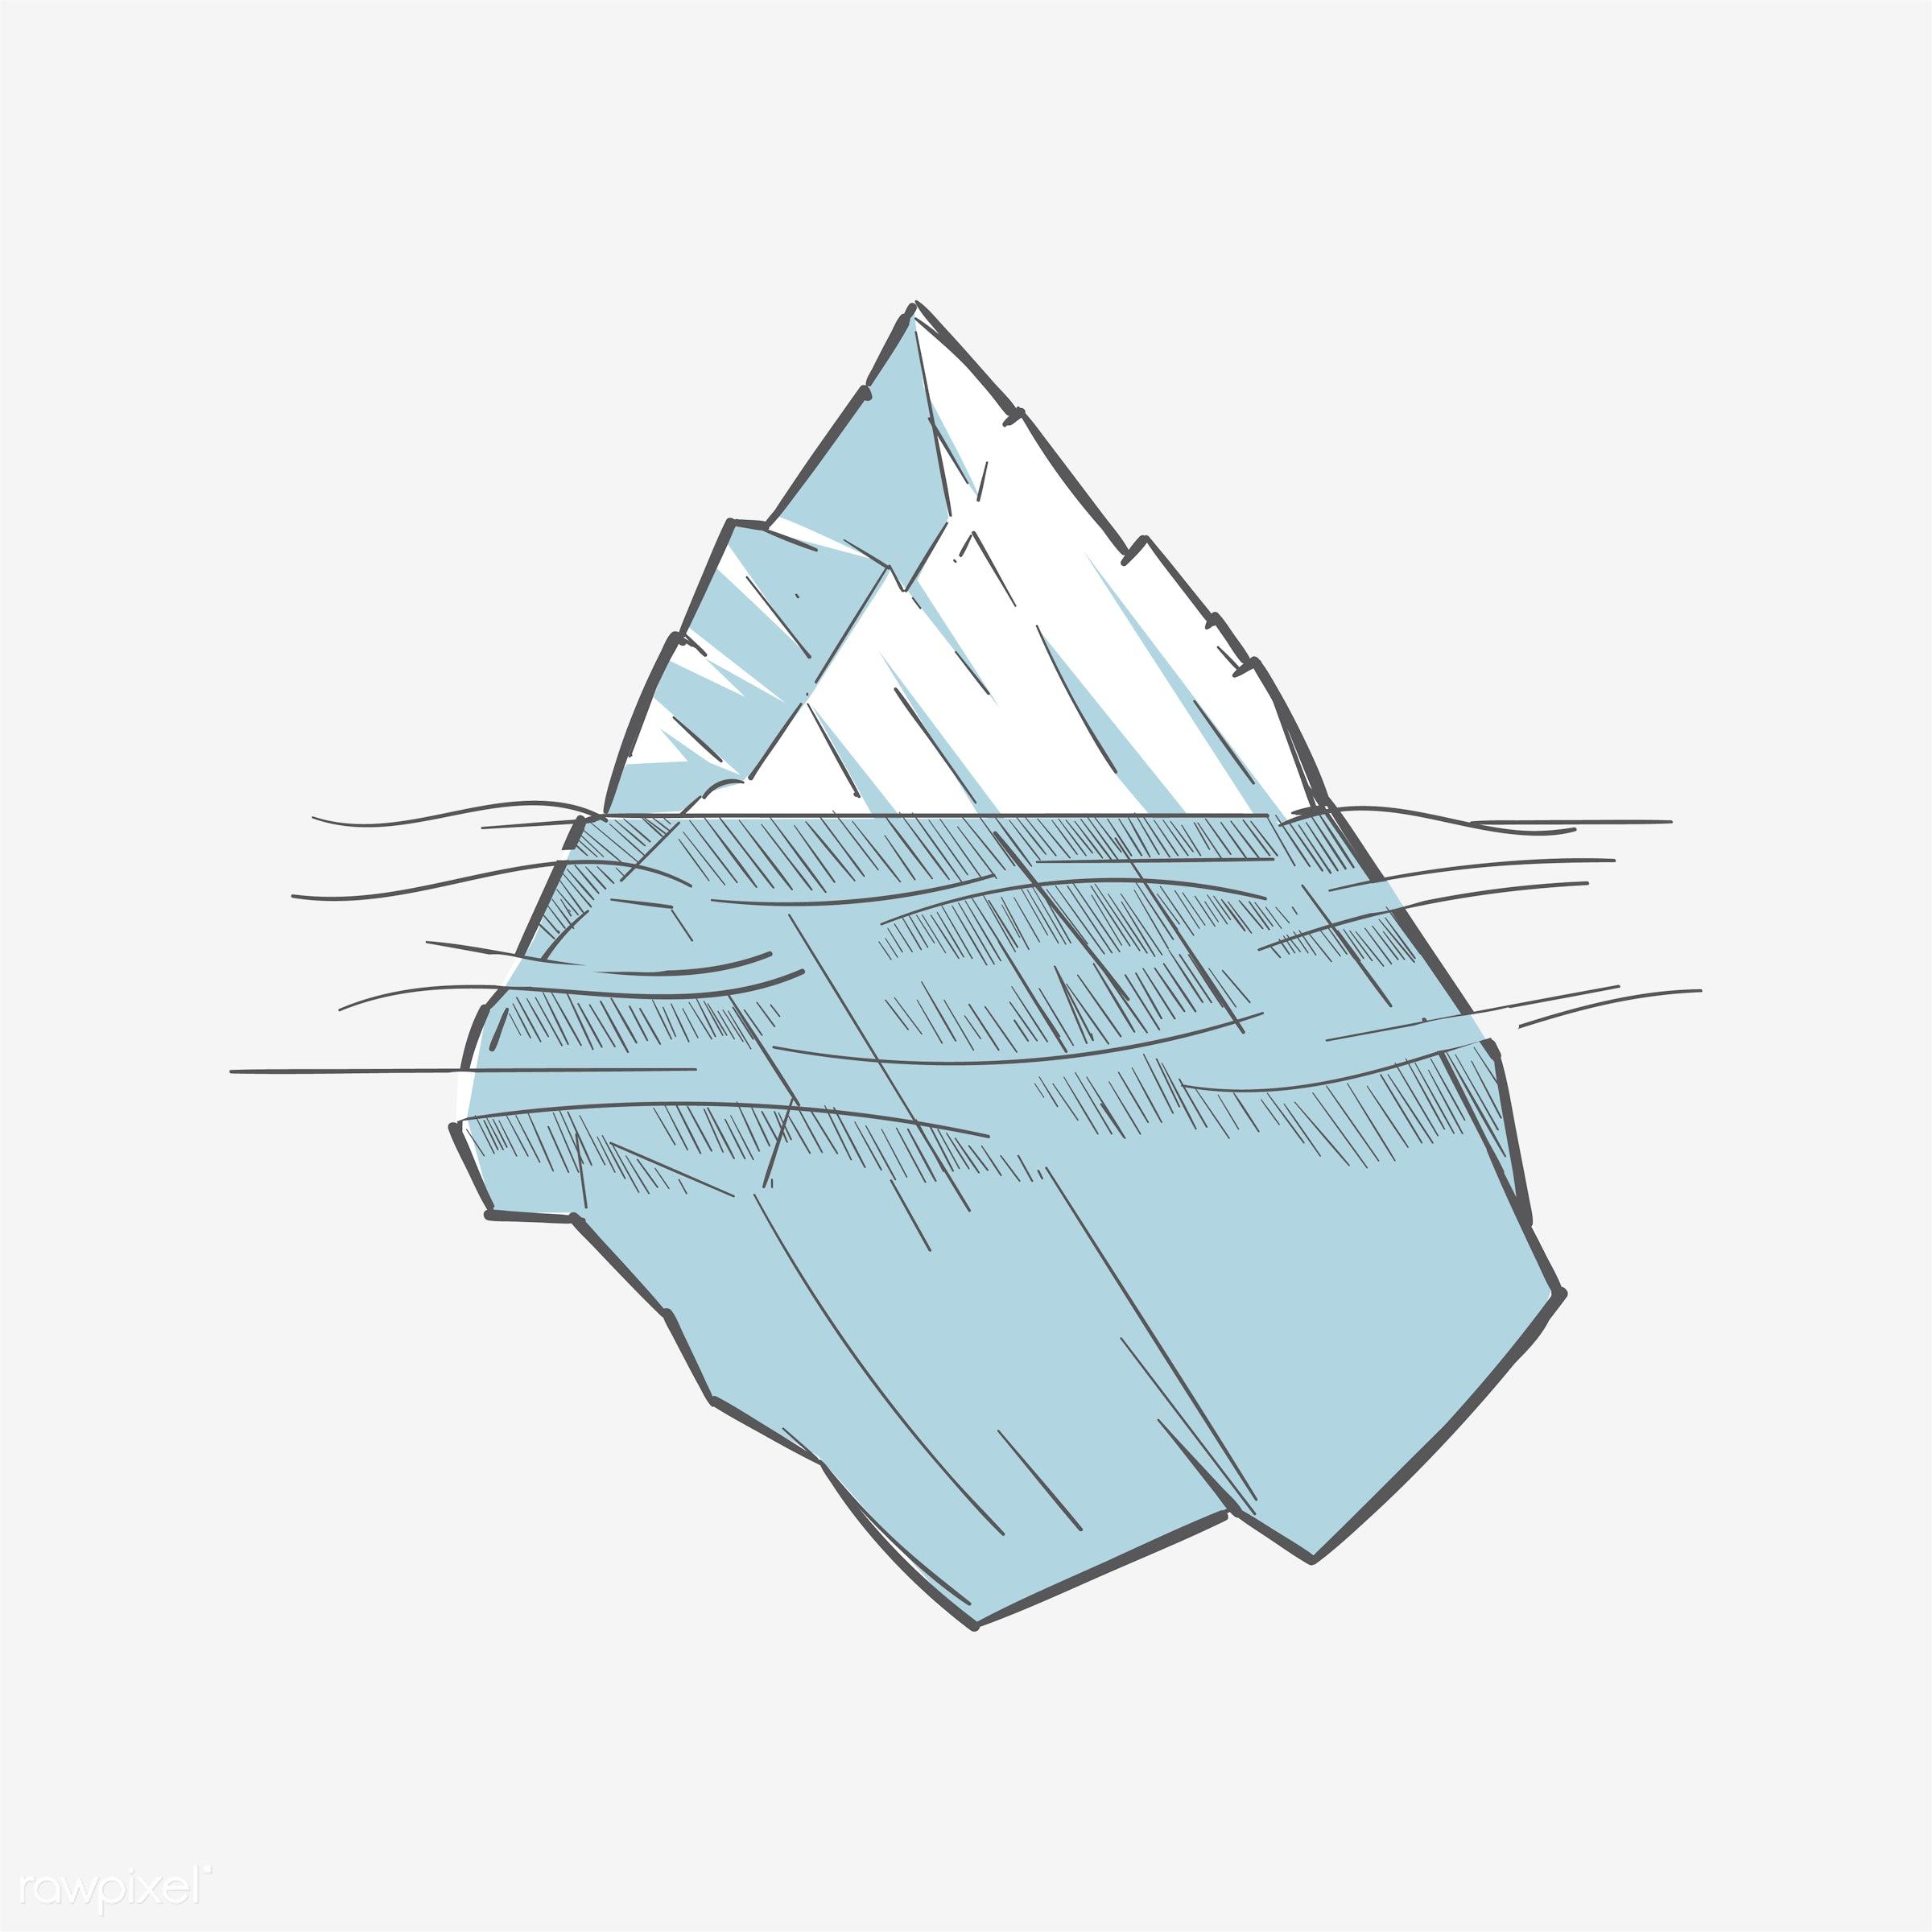 Hand drawing illustration of successful concept - ice, vector, winner, achievement, aim, art, artwork, business, challenge,...